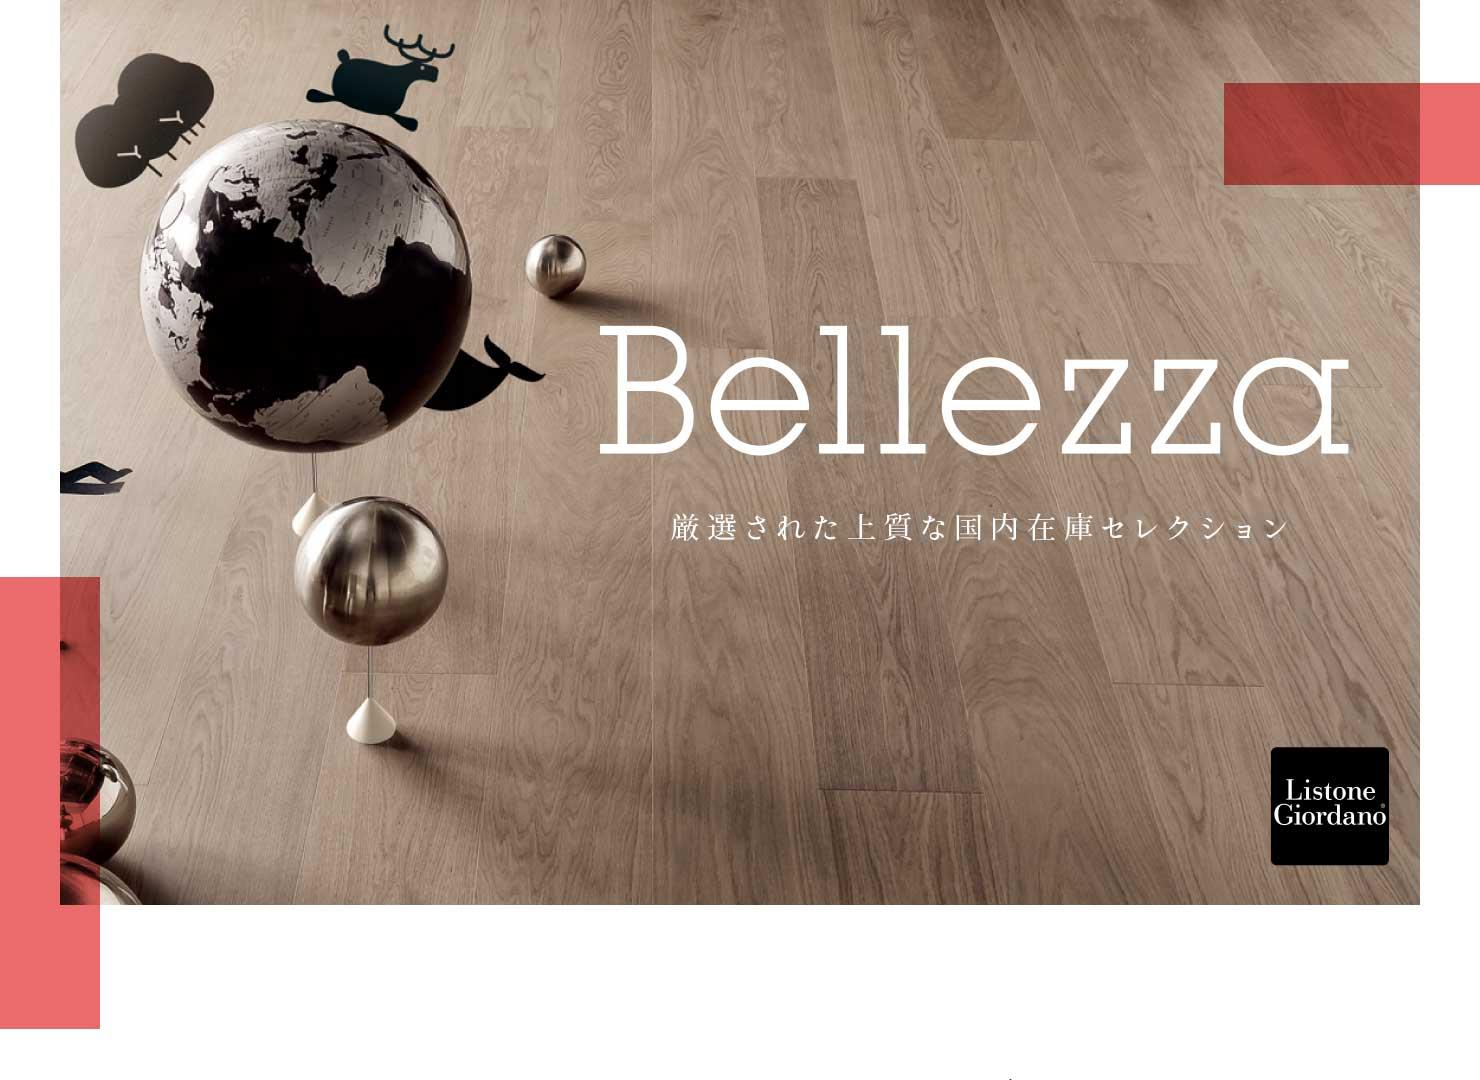 Bellezza 厳選された上質な国内在庫セレクション